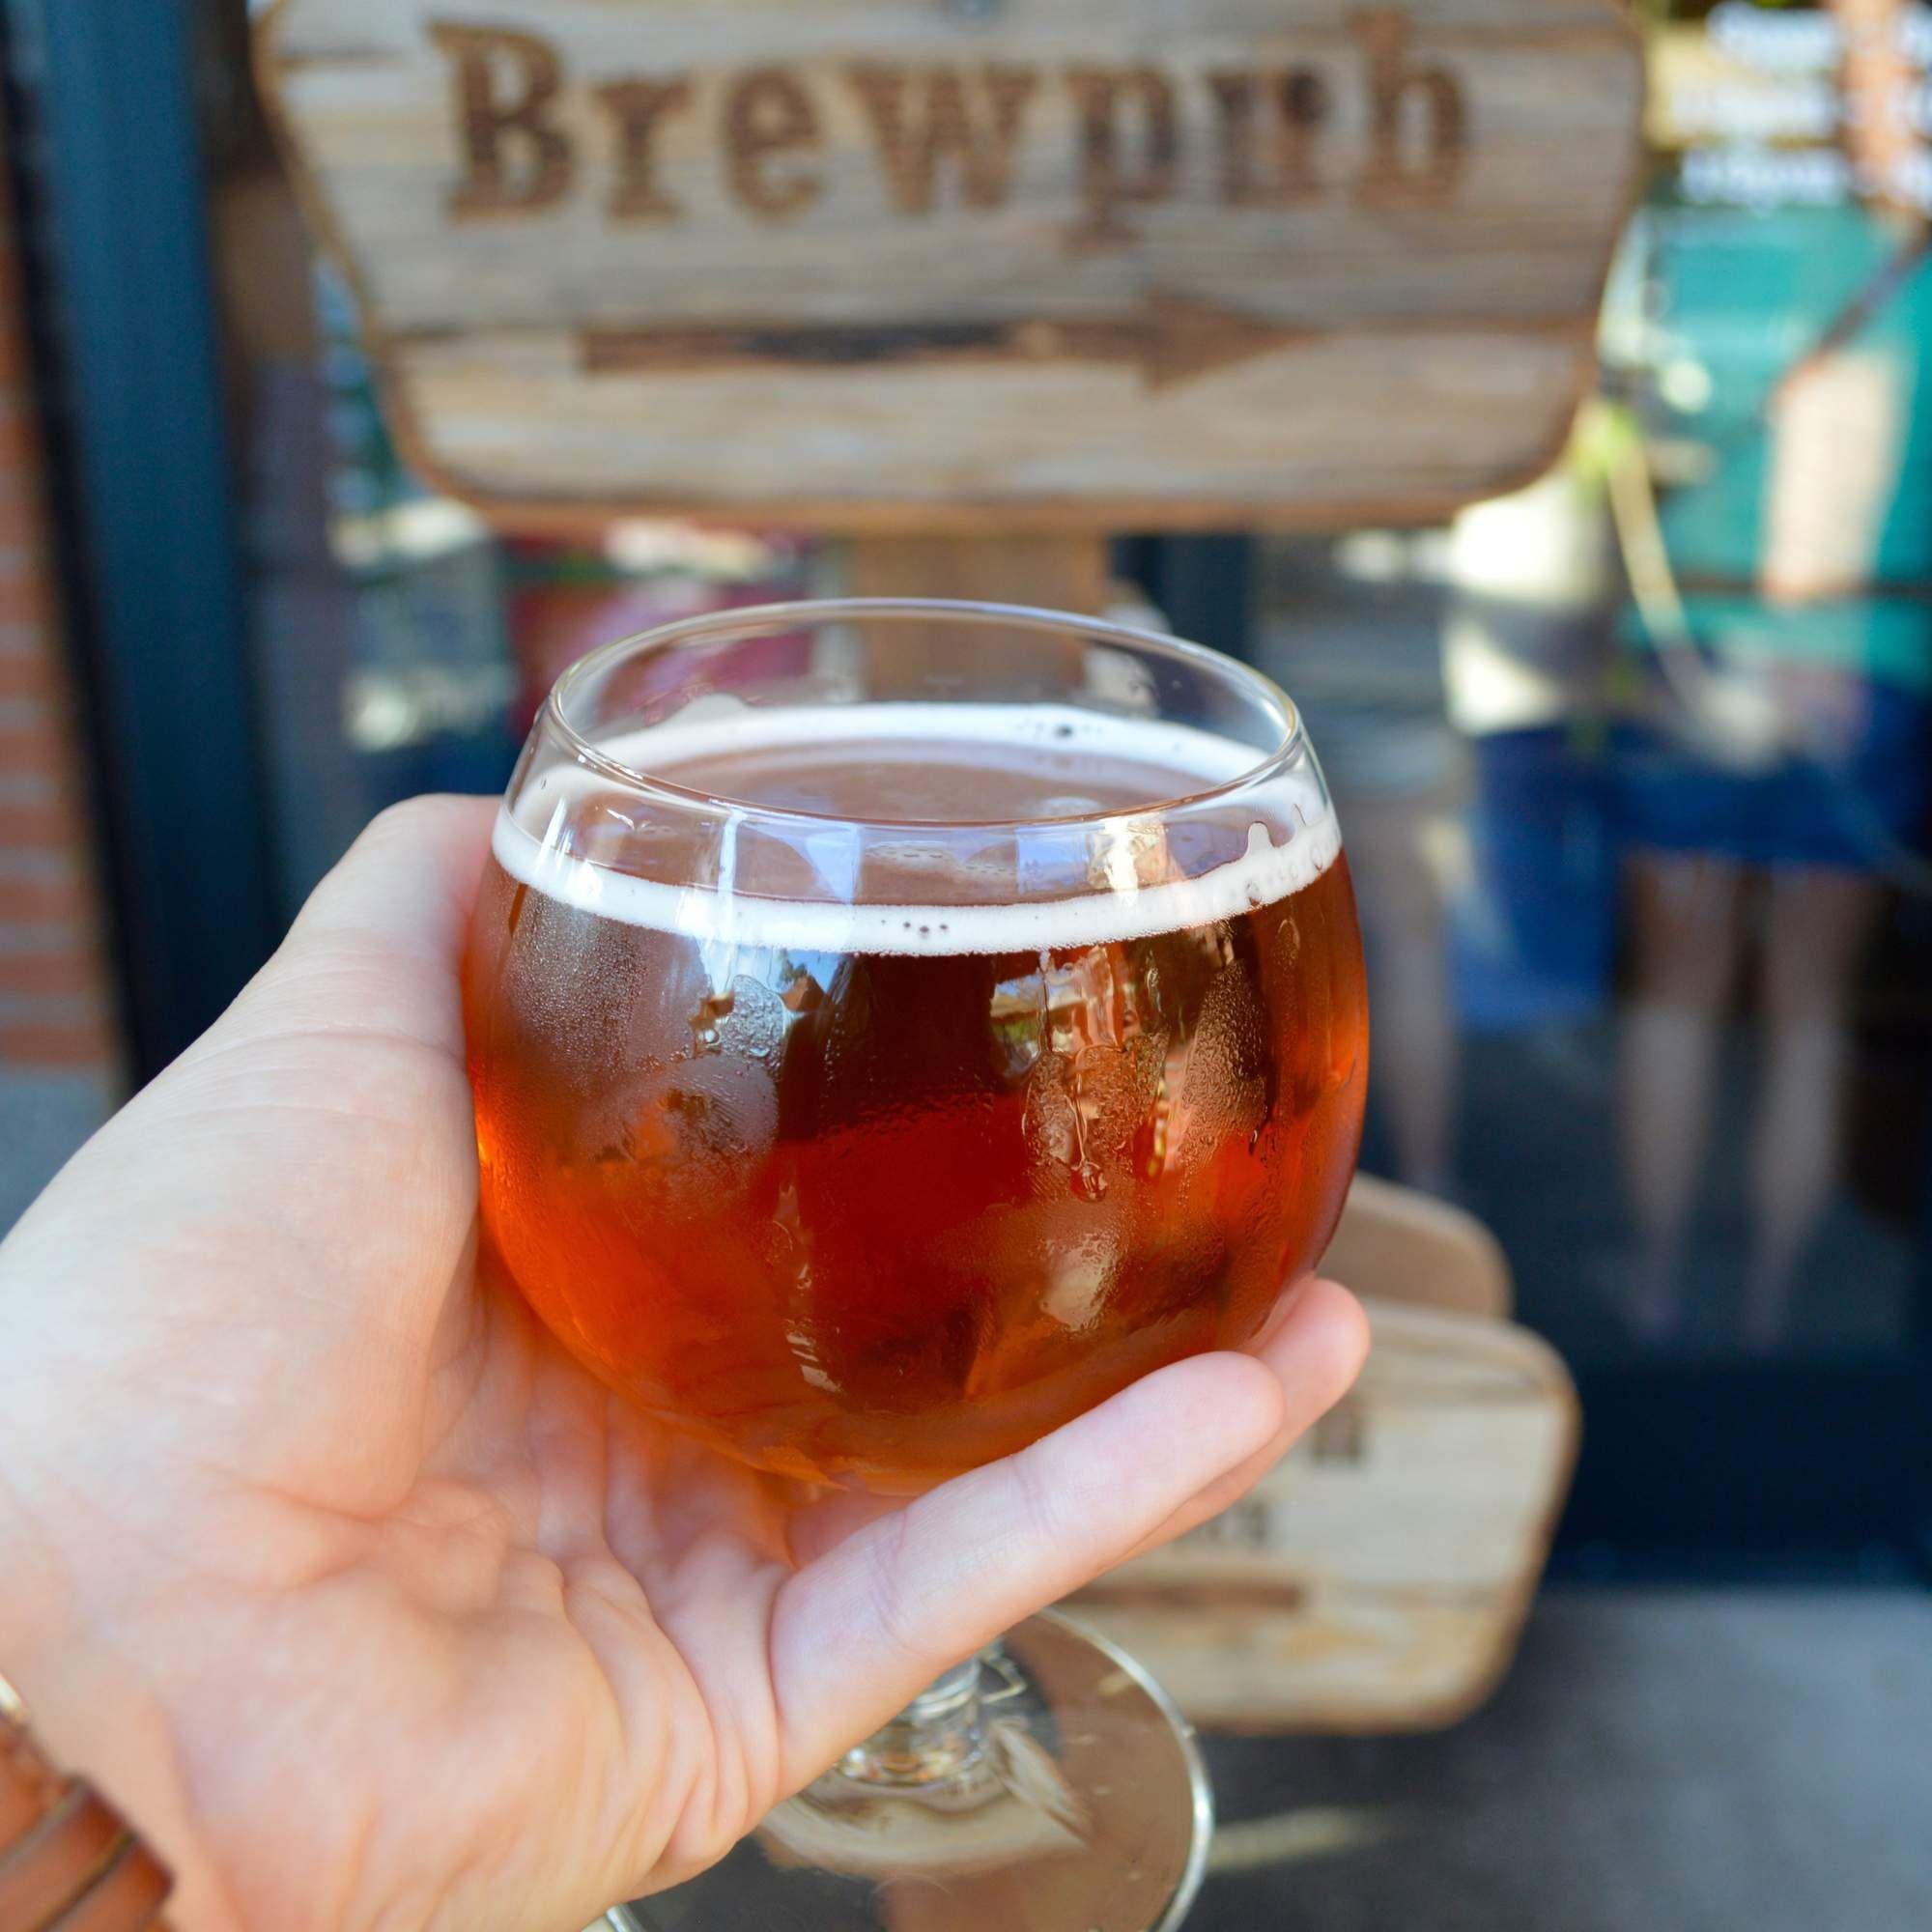 The 10 Best Breweries In Arizona Ranked In 2020 Brewery Arizona Beer Crafts